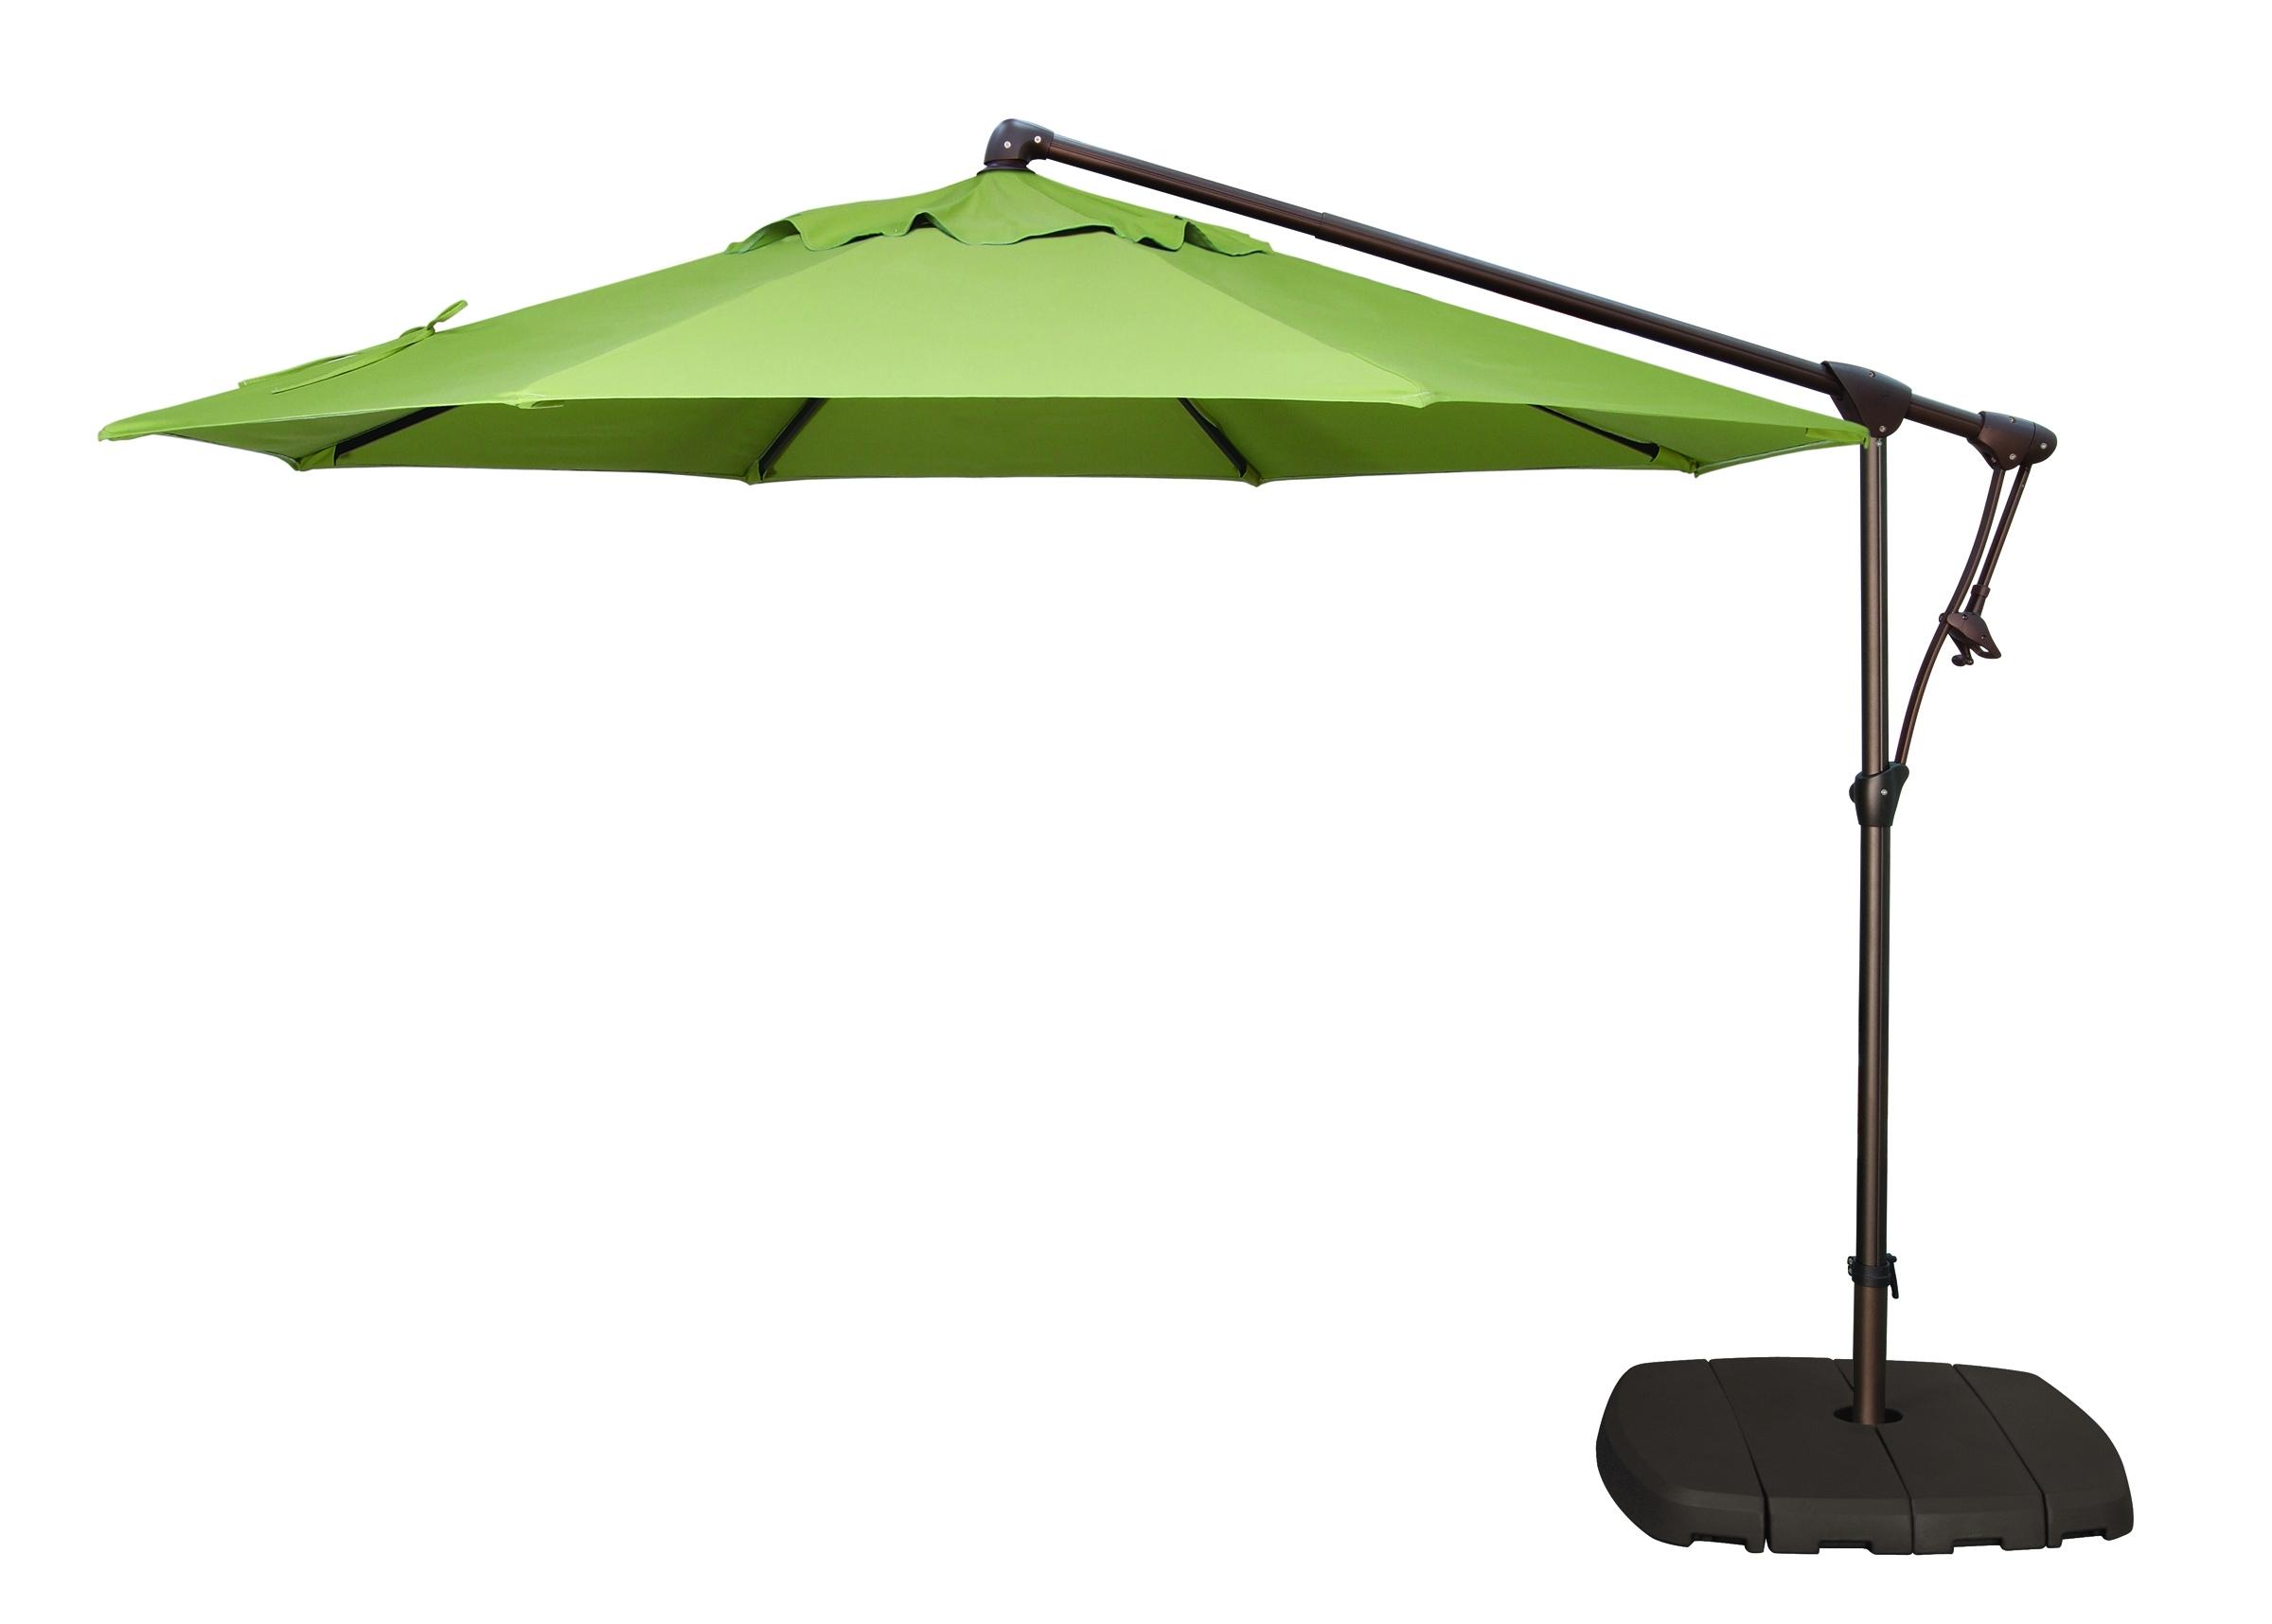 Most Current Sunbrella Patio Umbrellas At Walmart Intended For Patio Umbrellas Walmart – Home Design Ideas (View 11 of 20)